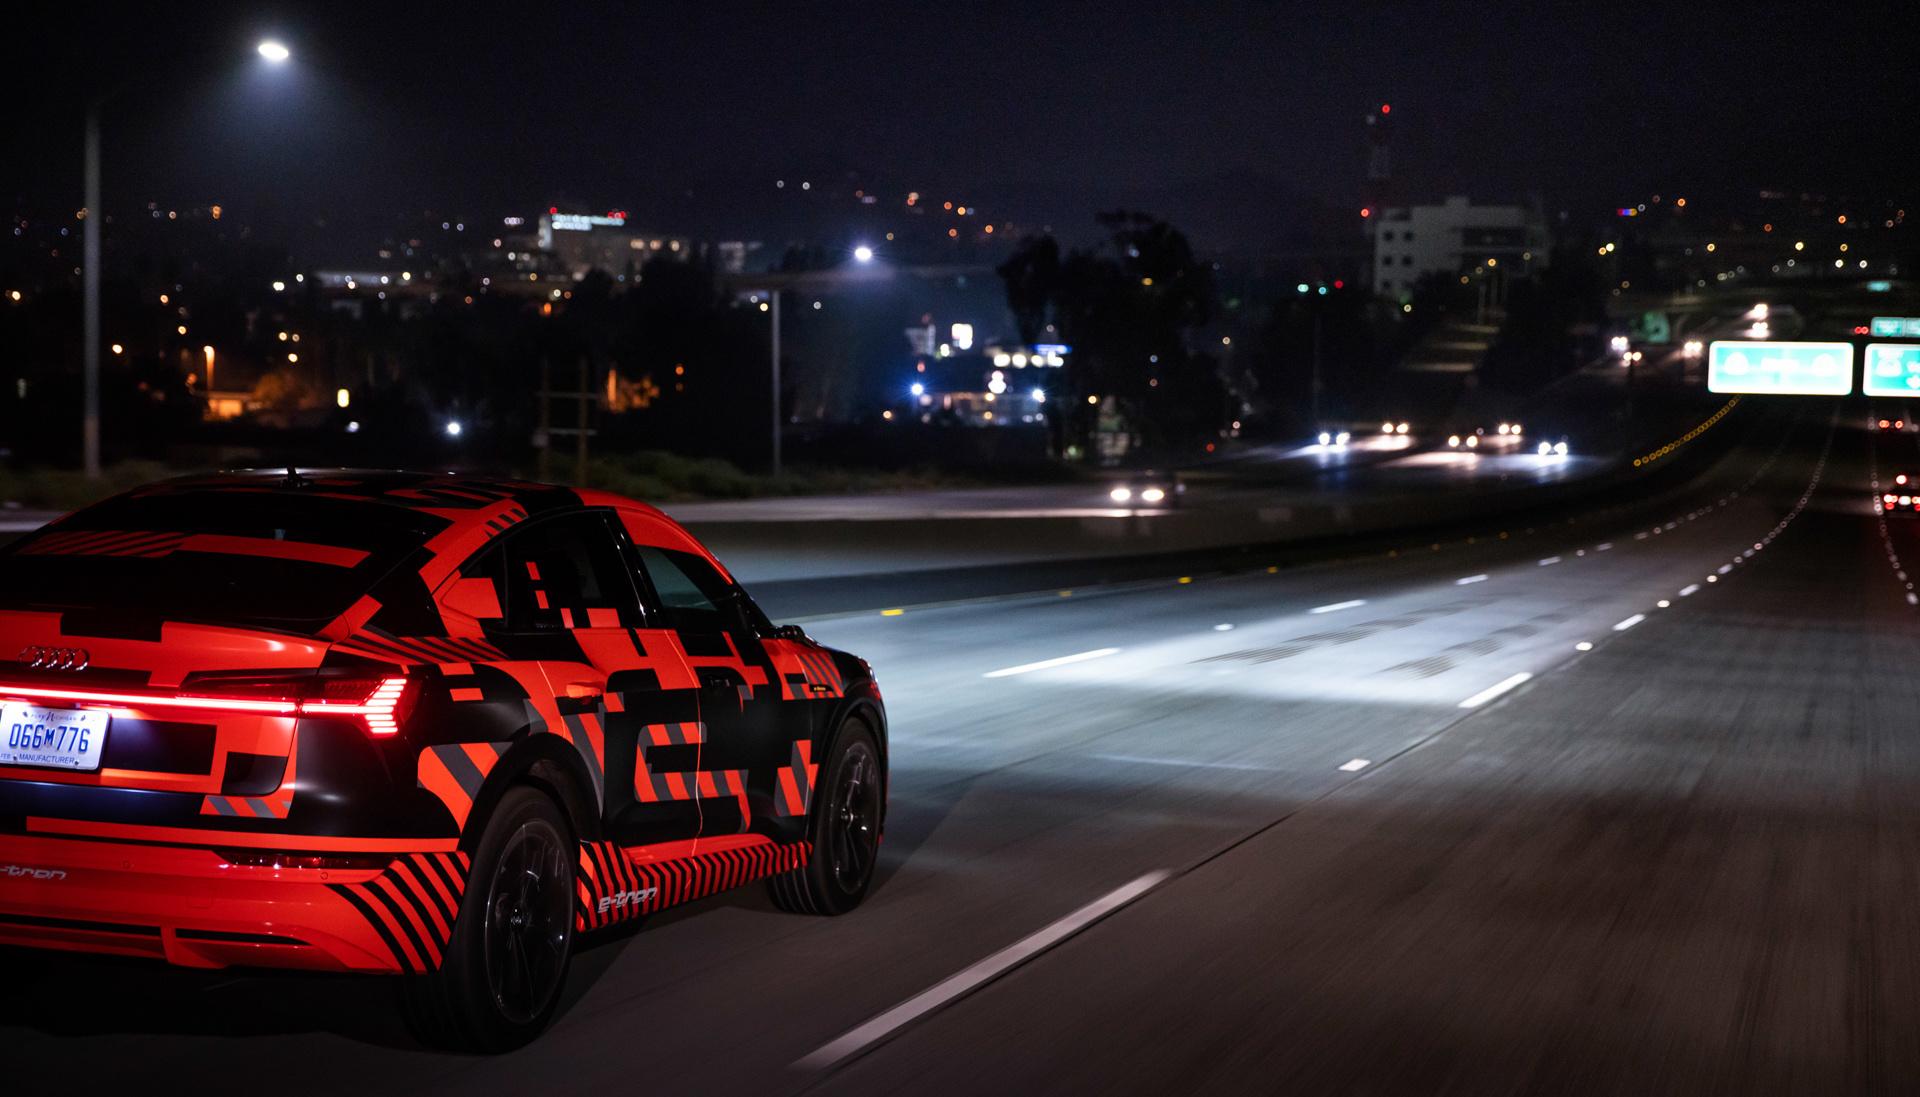 Audi Announces New Digital Matrix LED Headlights - The Next Avenue